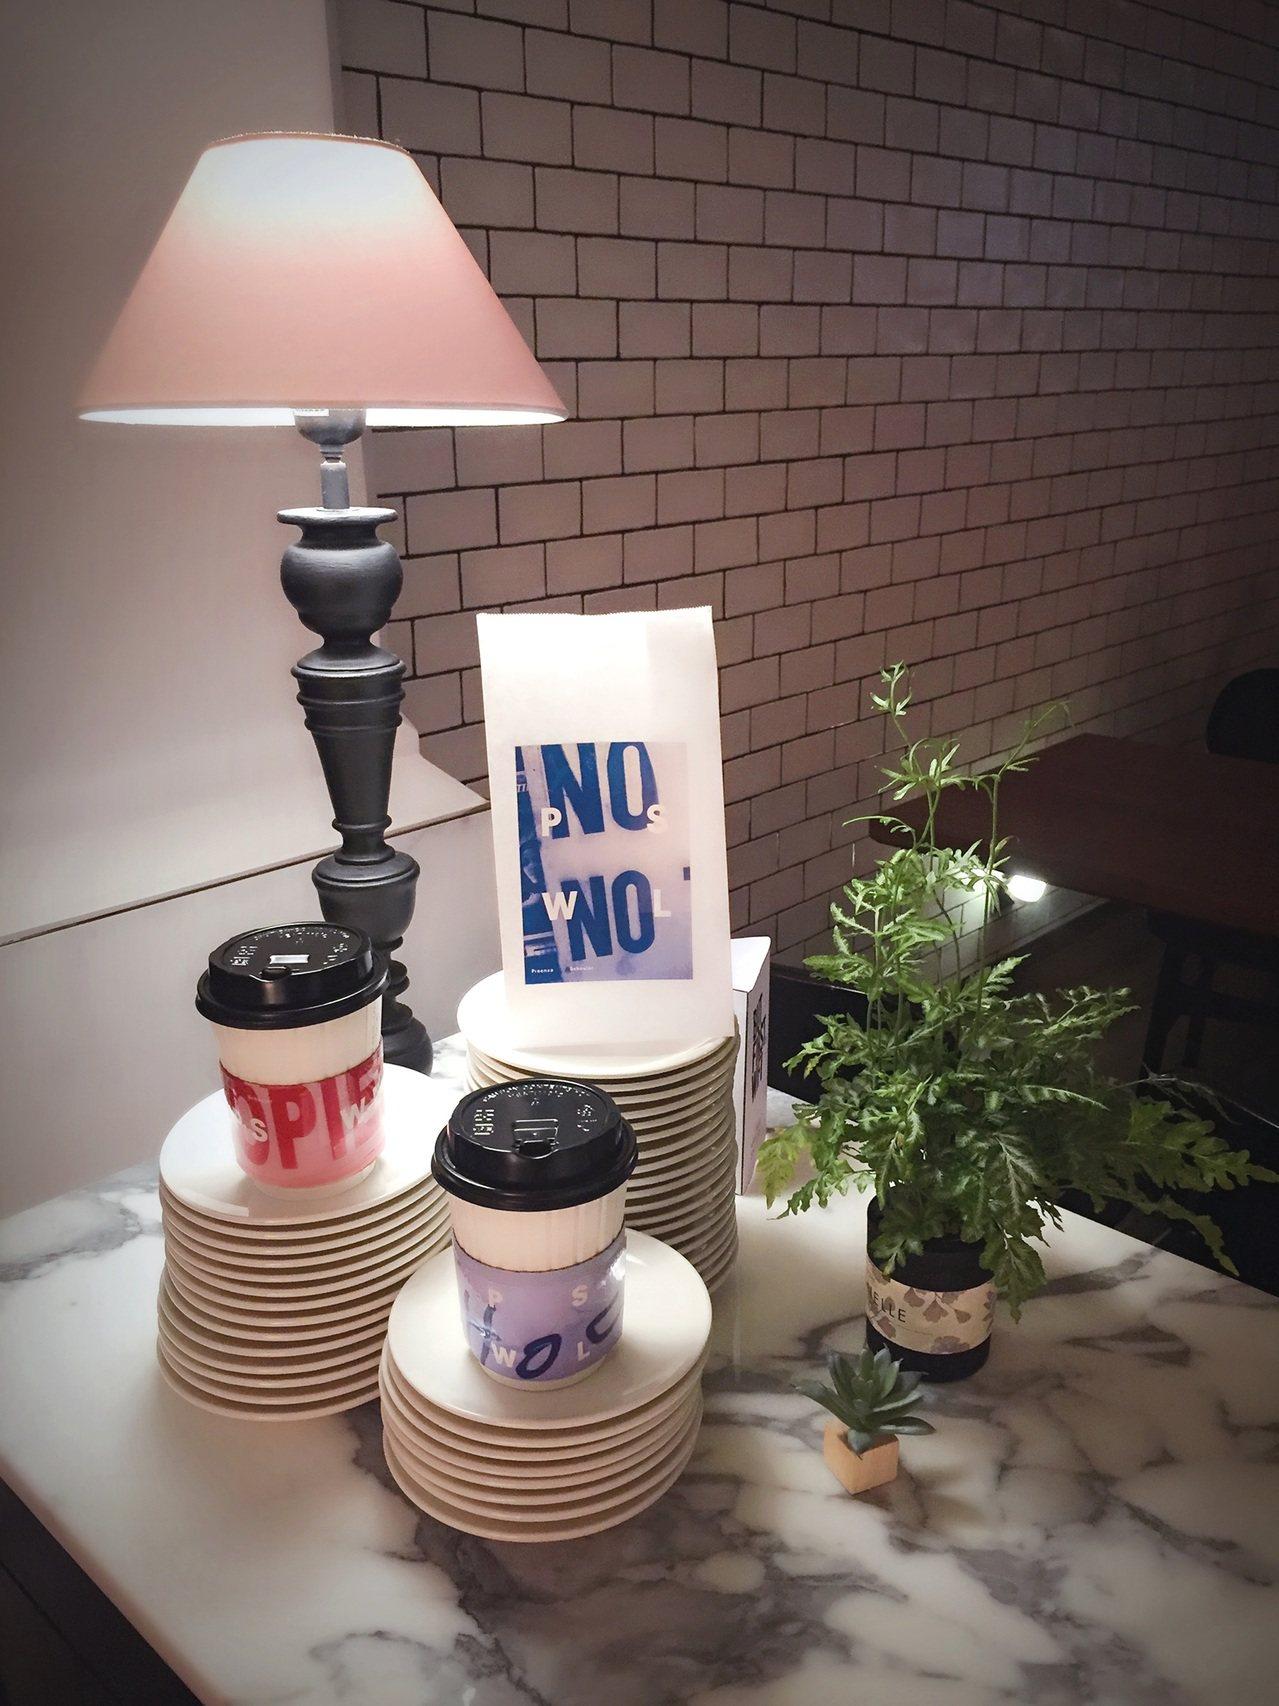 PSWL系列和Angel Cafe推出限量咖啡外帶杯套及紙袋。圖/Proenza...